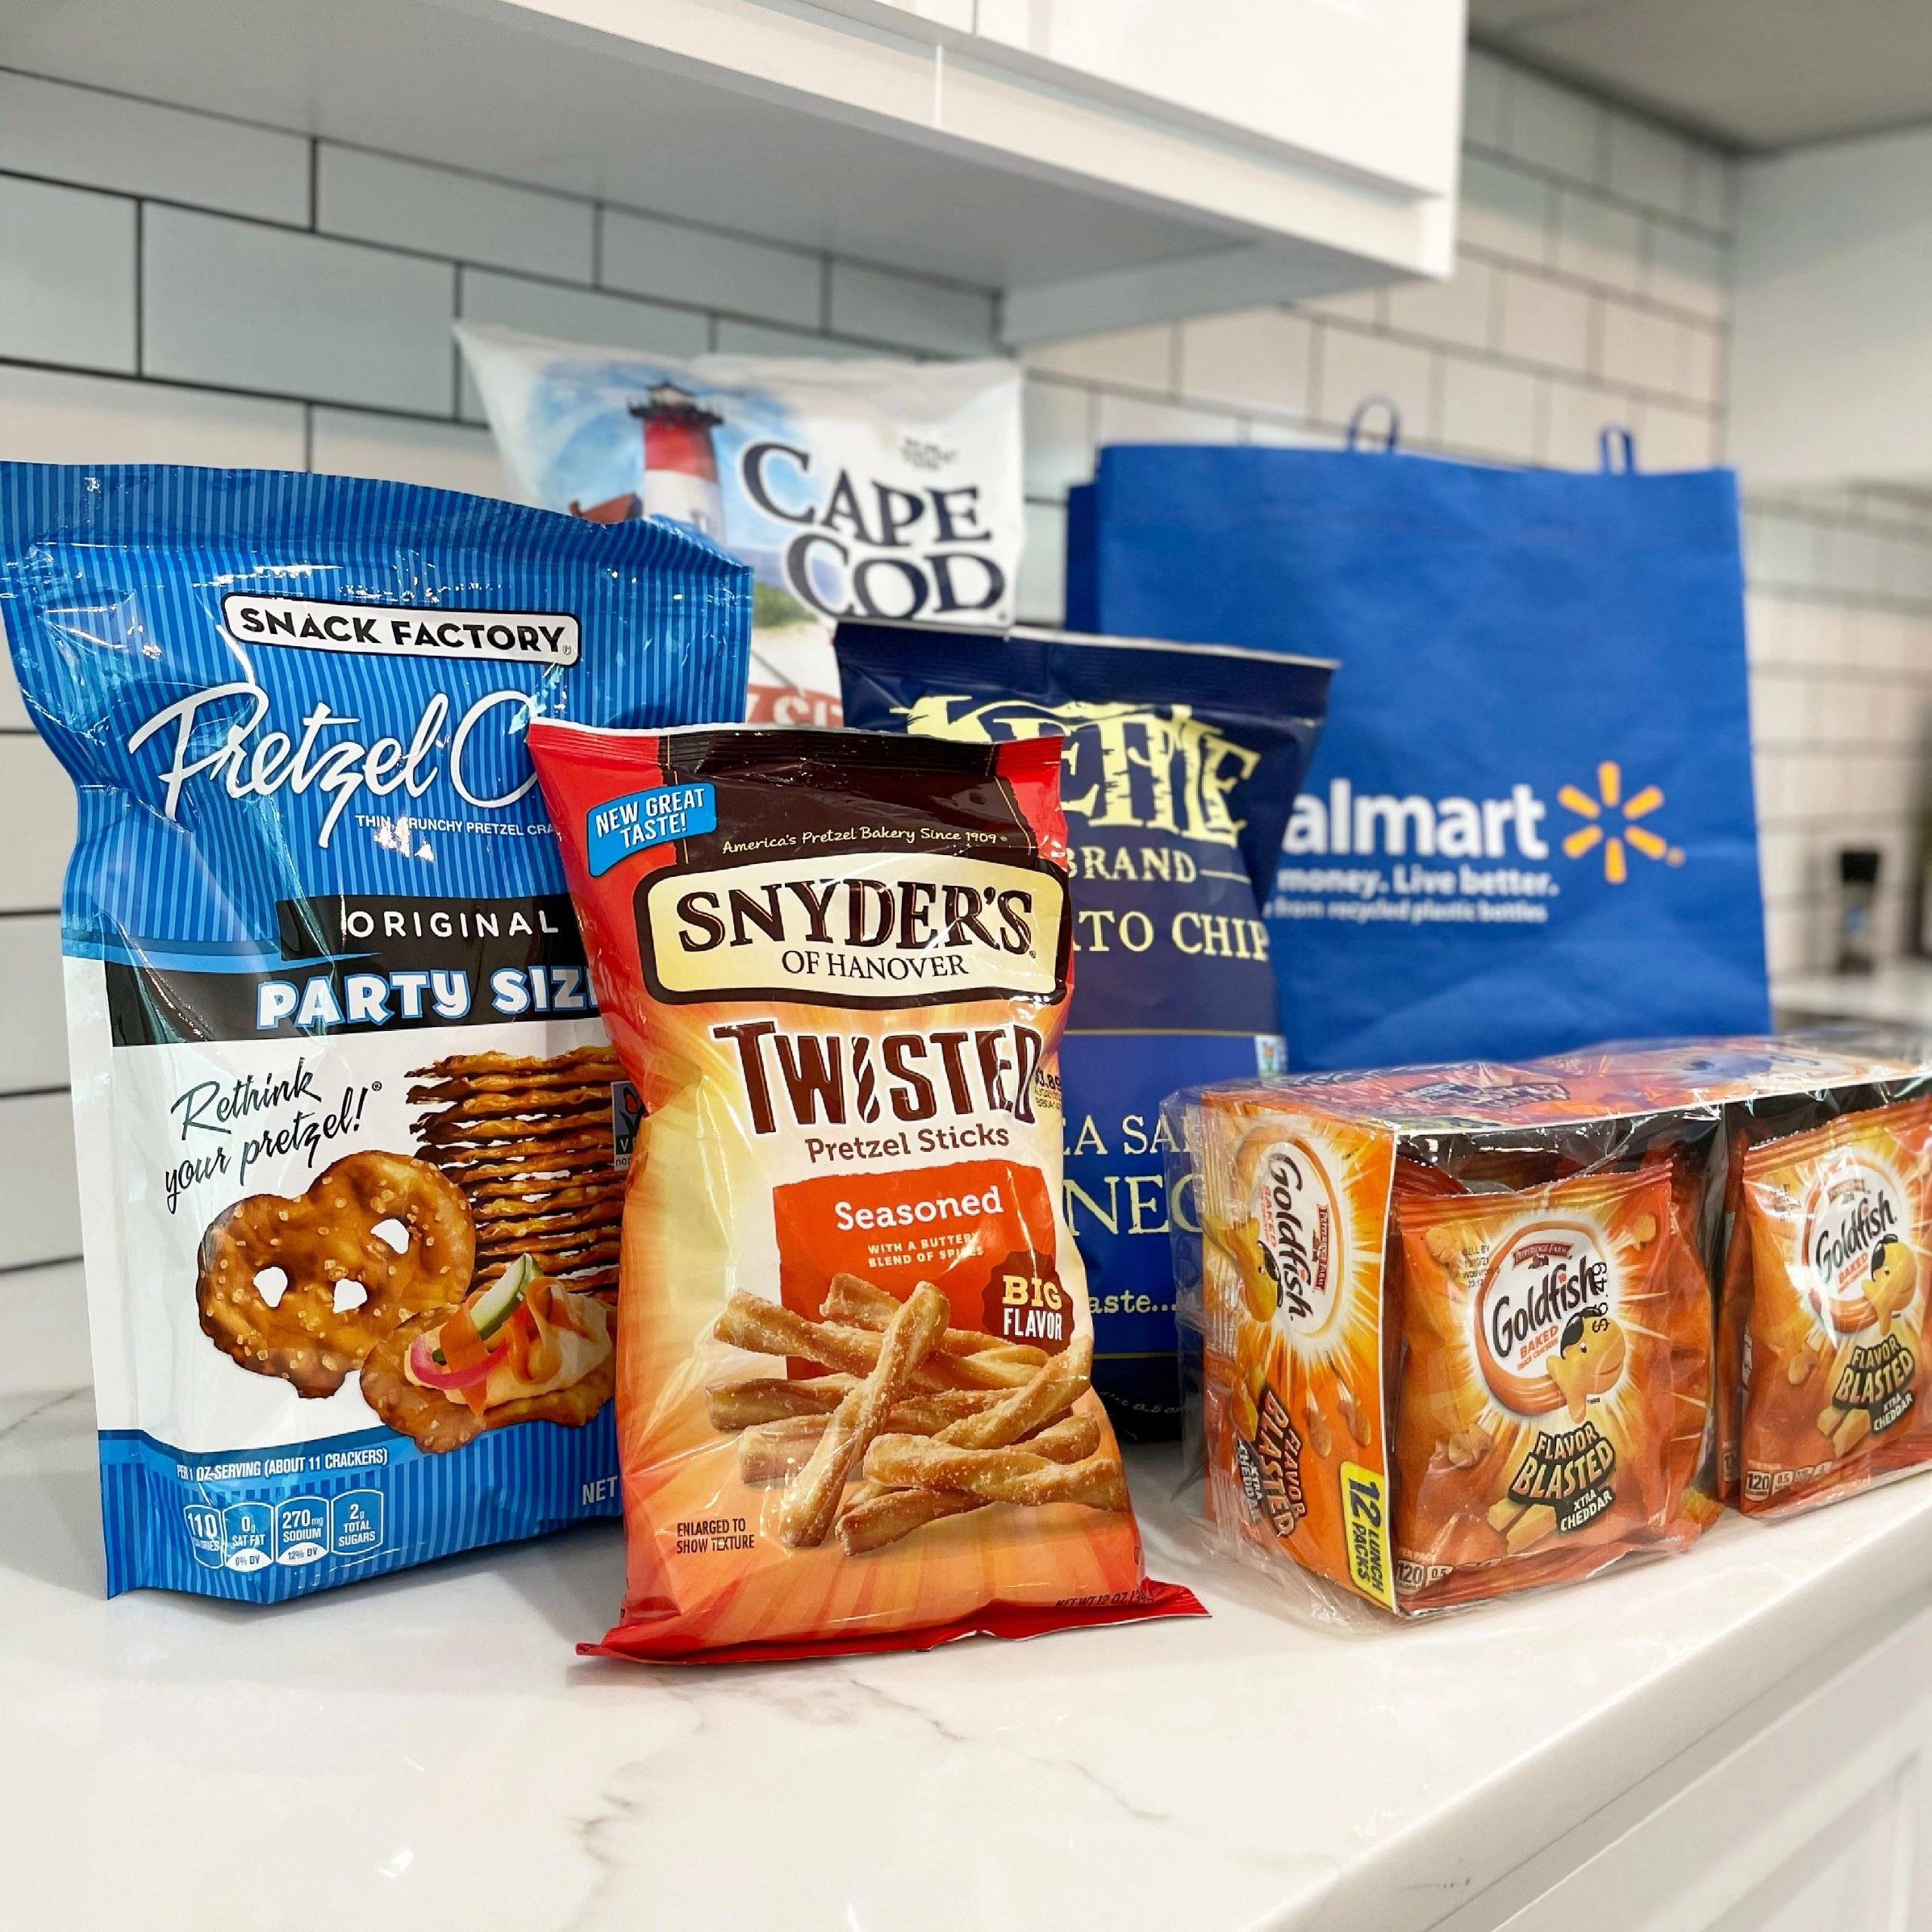 Summer Snacking Favorites - Goldfish, Snyder's Twisted Pretzel Sticks, Kettle Brand Chips and More